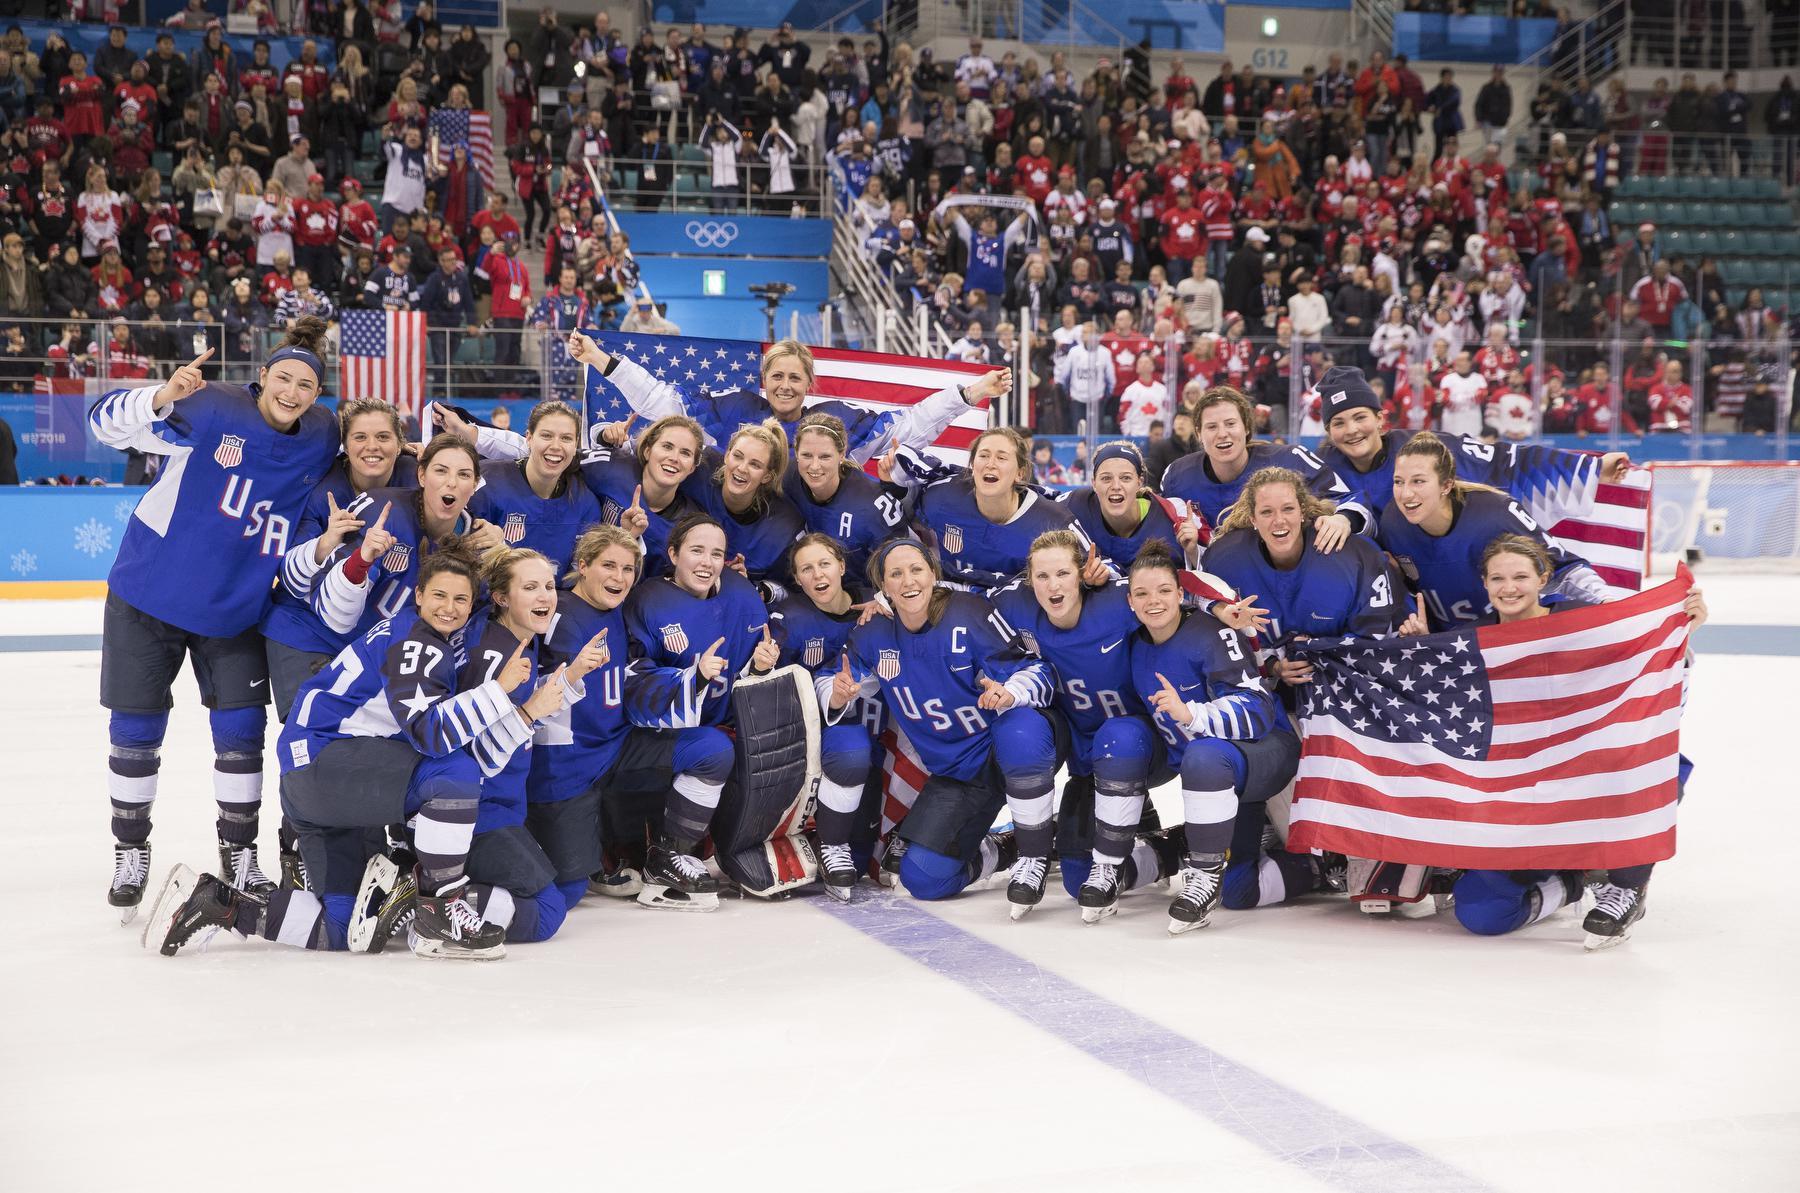 9b5df3a0626 U.S. Women Golden at 2018 Olympics